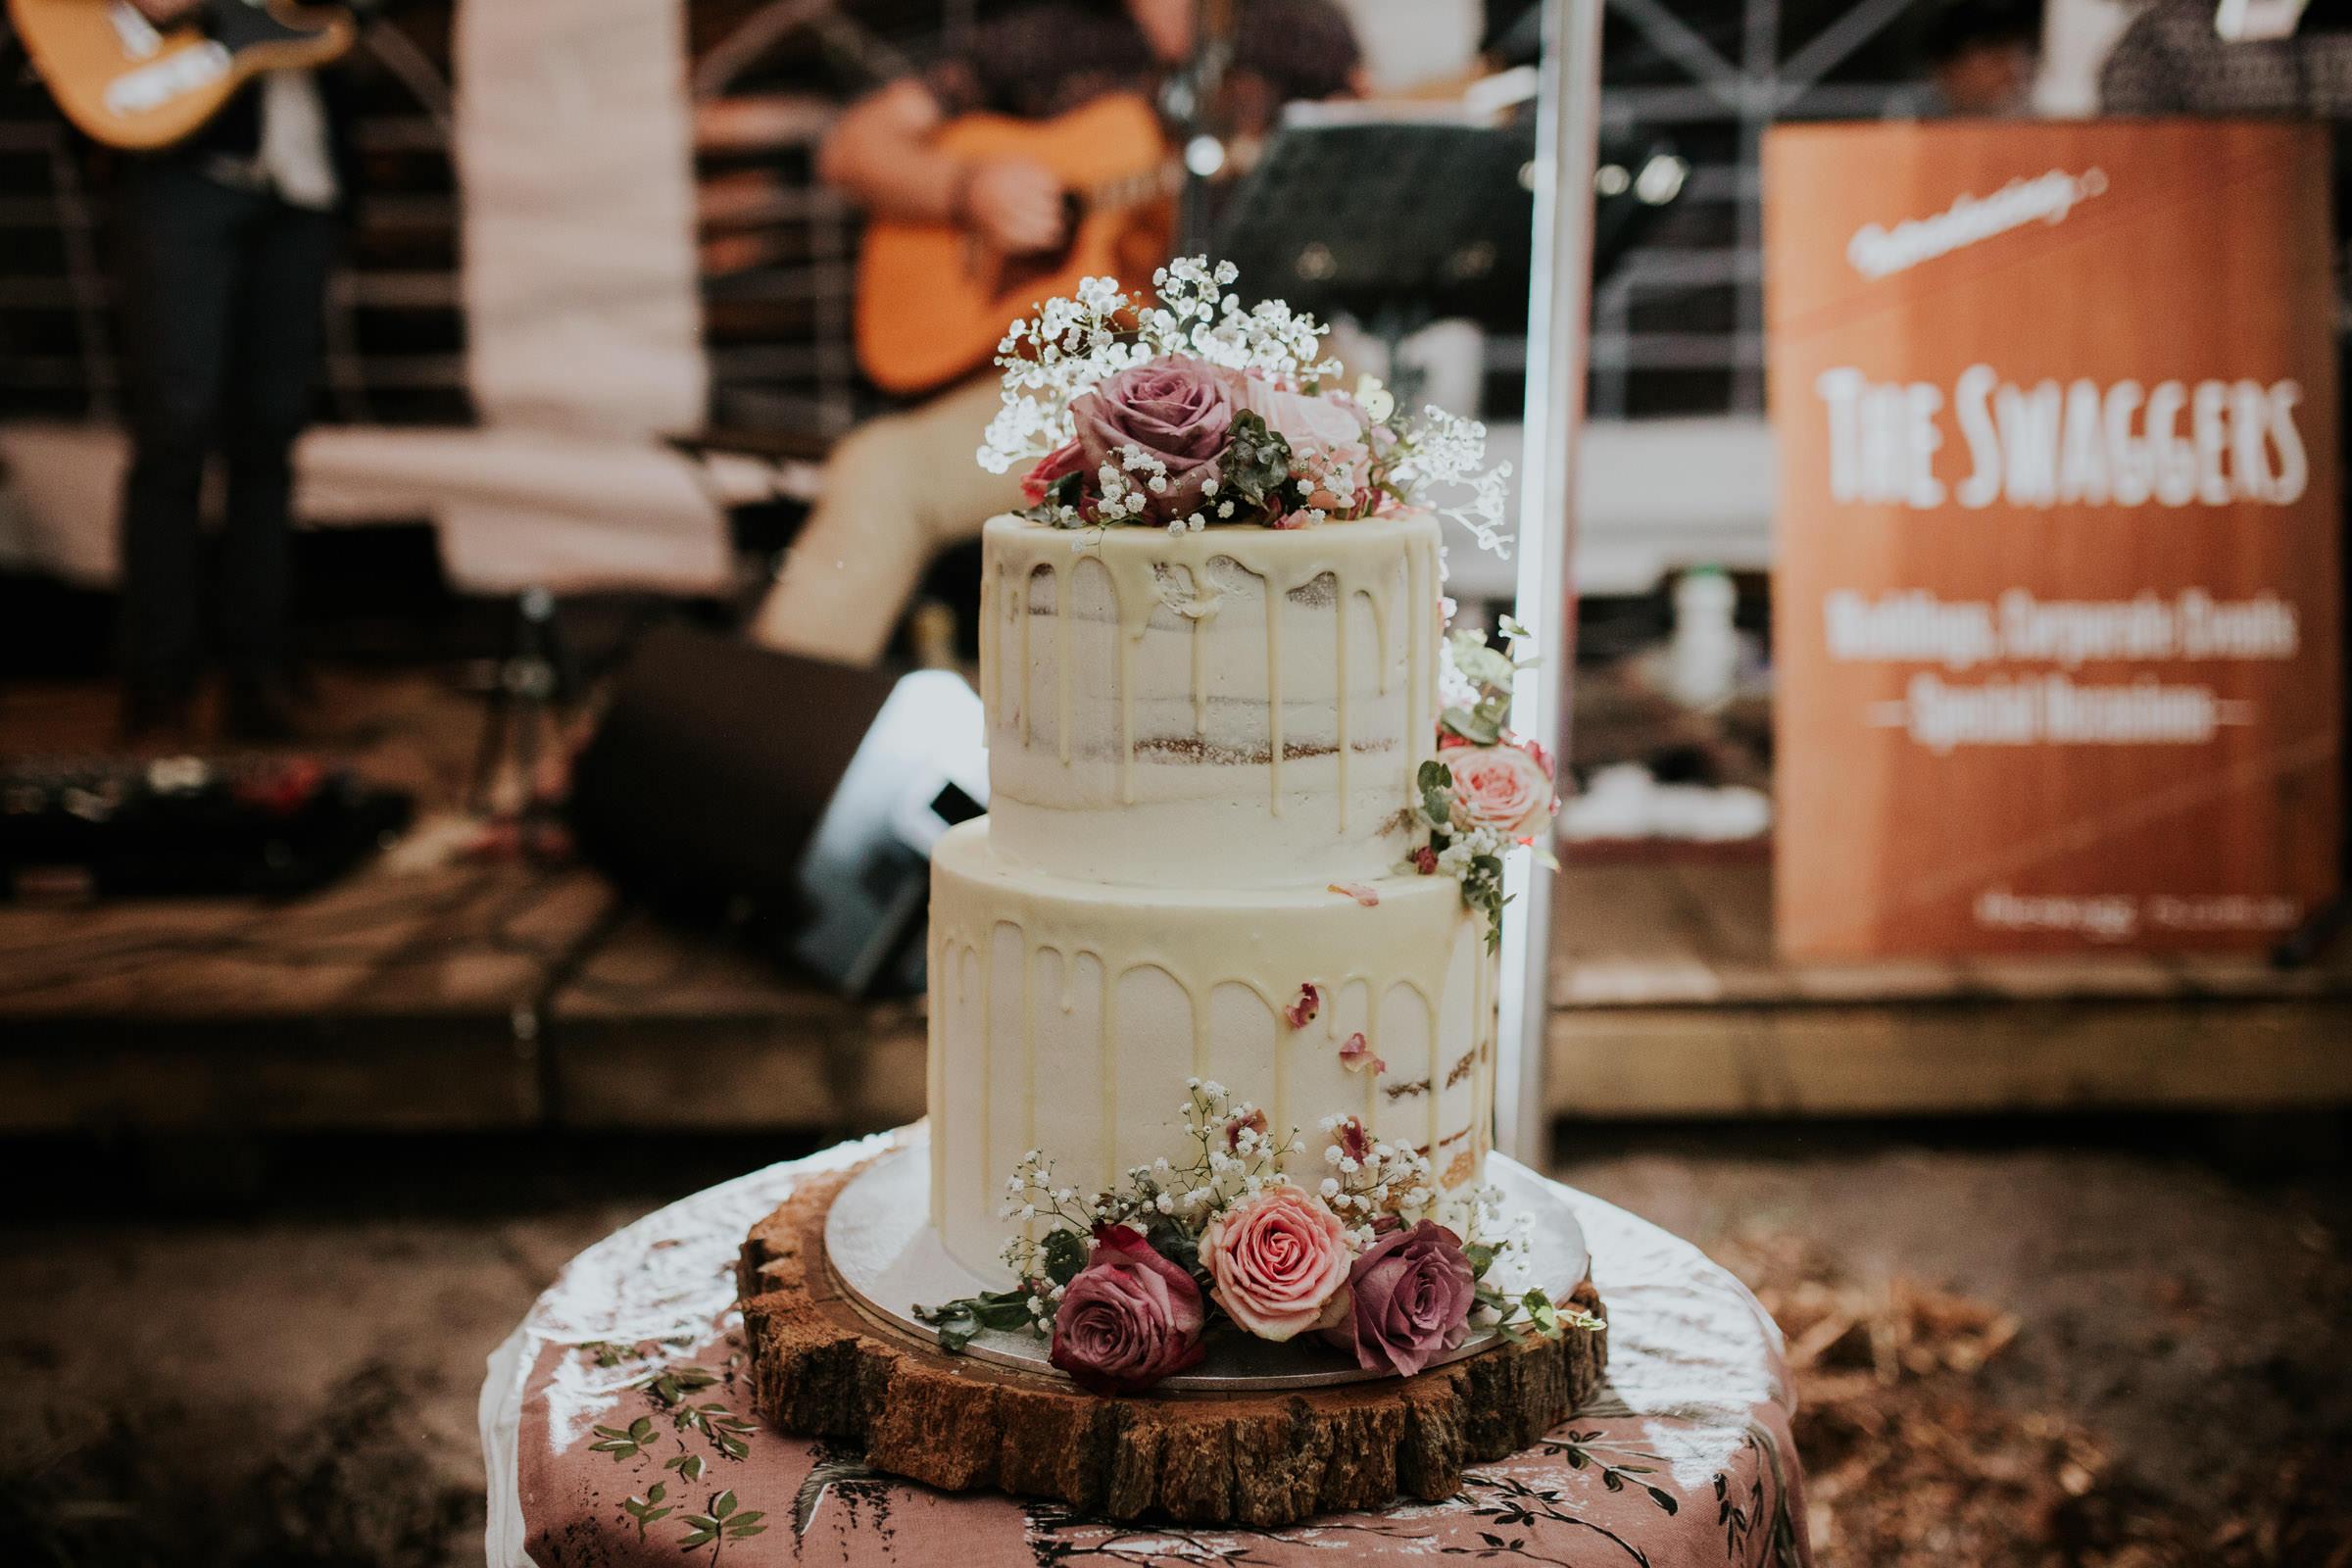 Emma+John+Far+South+Coast+Wedding+Festivl+Glamping+Bush-158.jpg